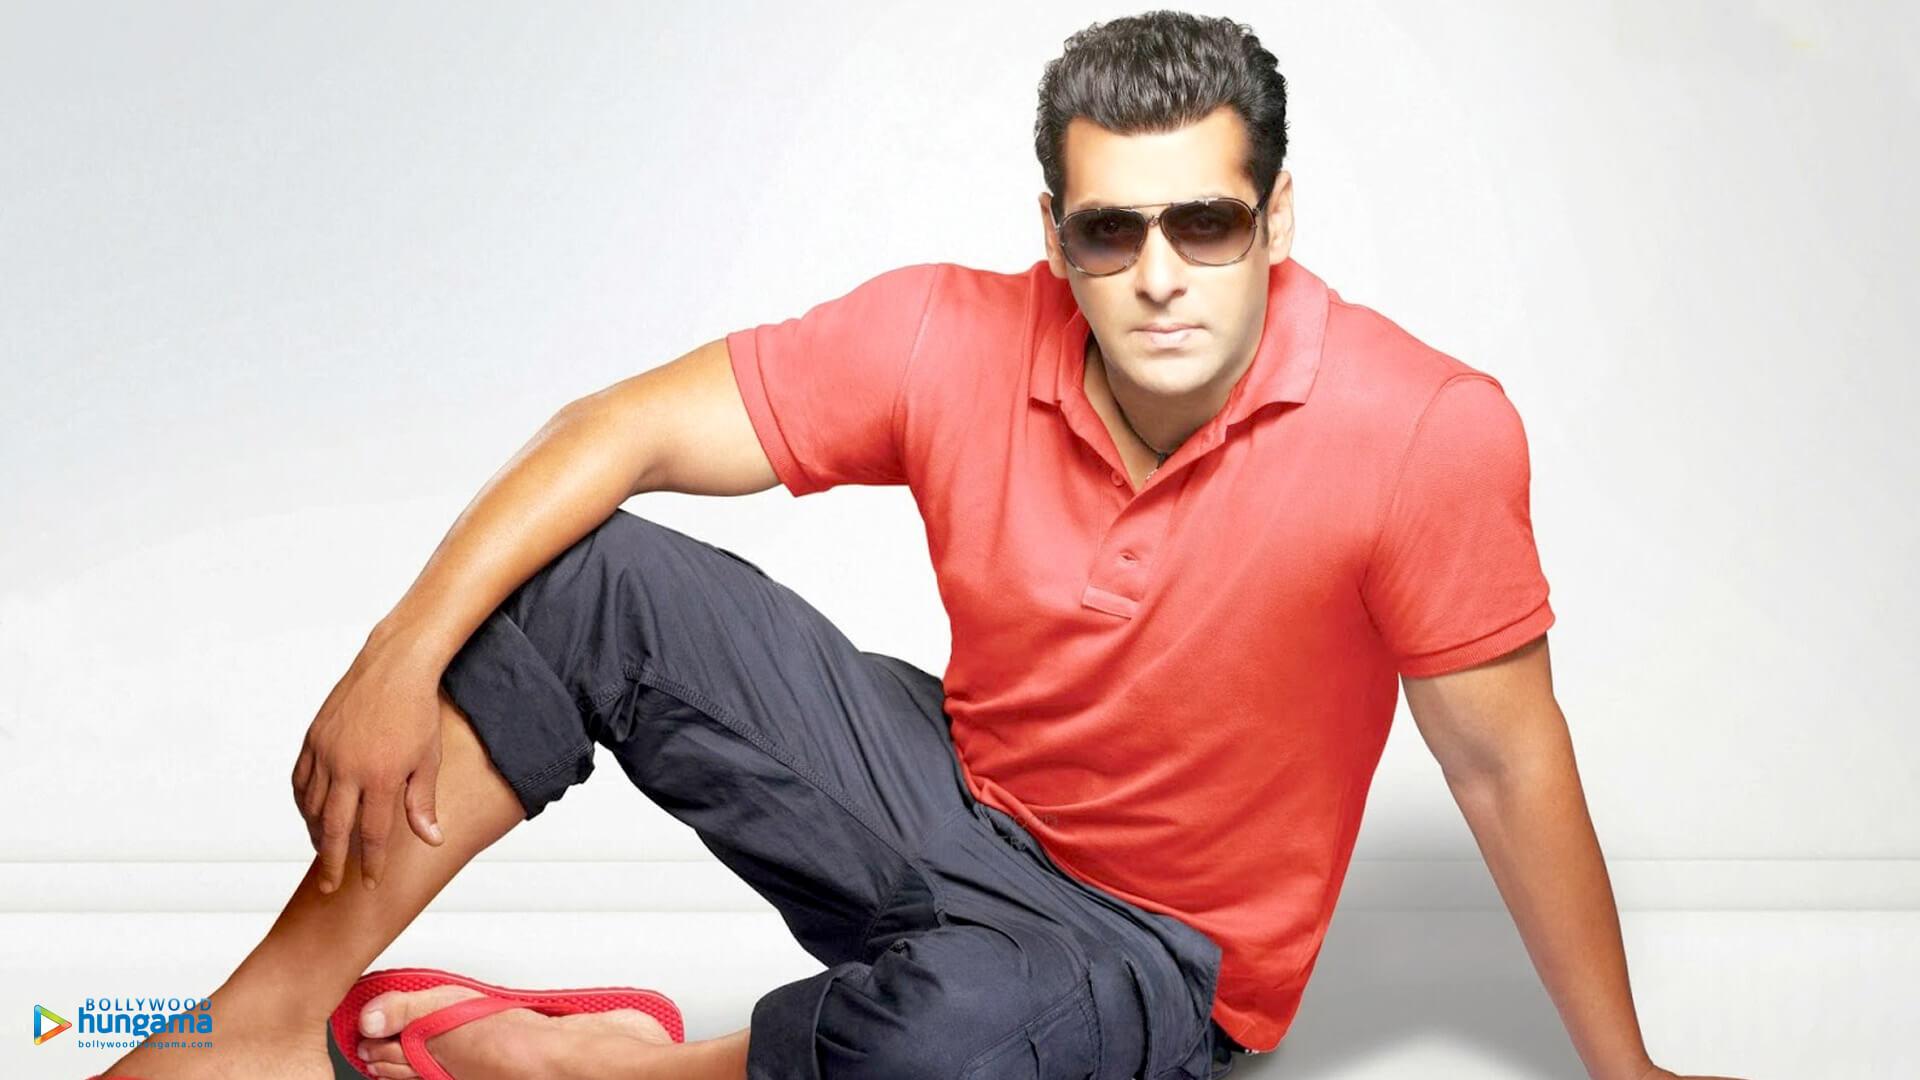 Salman Khan Photo, Age, News, Birthday, Height, Sister, Biography, Girlfriend, Awards, Address, Song, Video, Net Worth, Education, Twitter, Instagram, Facebook, Wiki, Imdb, Website, Youtube (25)